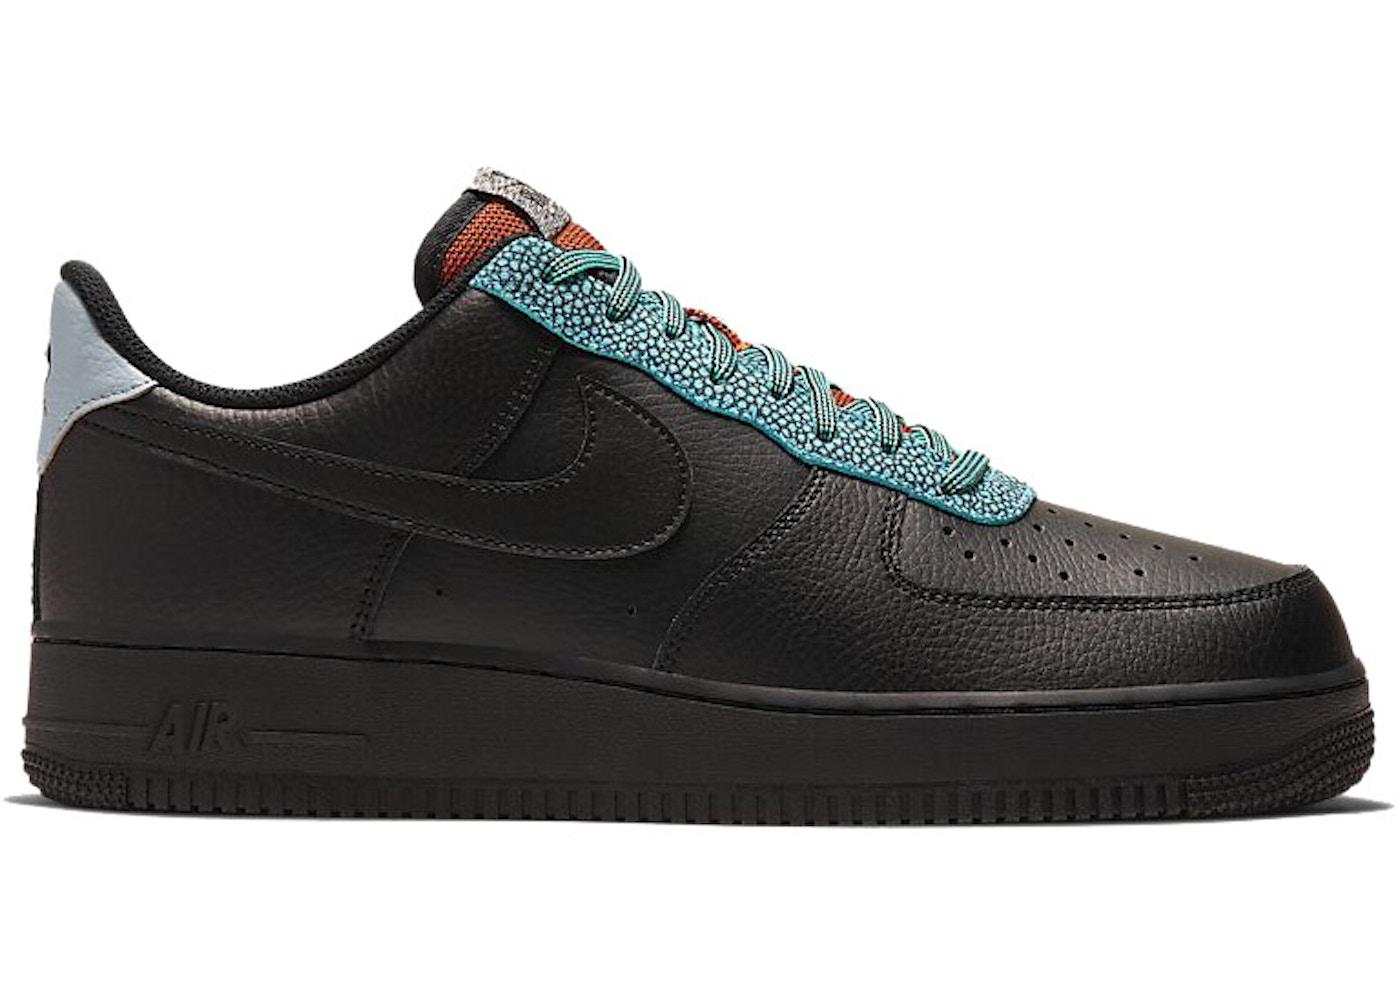 dinámica Proscrito compromiso  Nike Air Force 1 '07 LV8 Black - CK4363-001